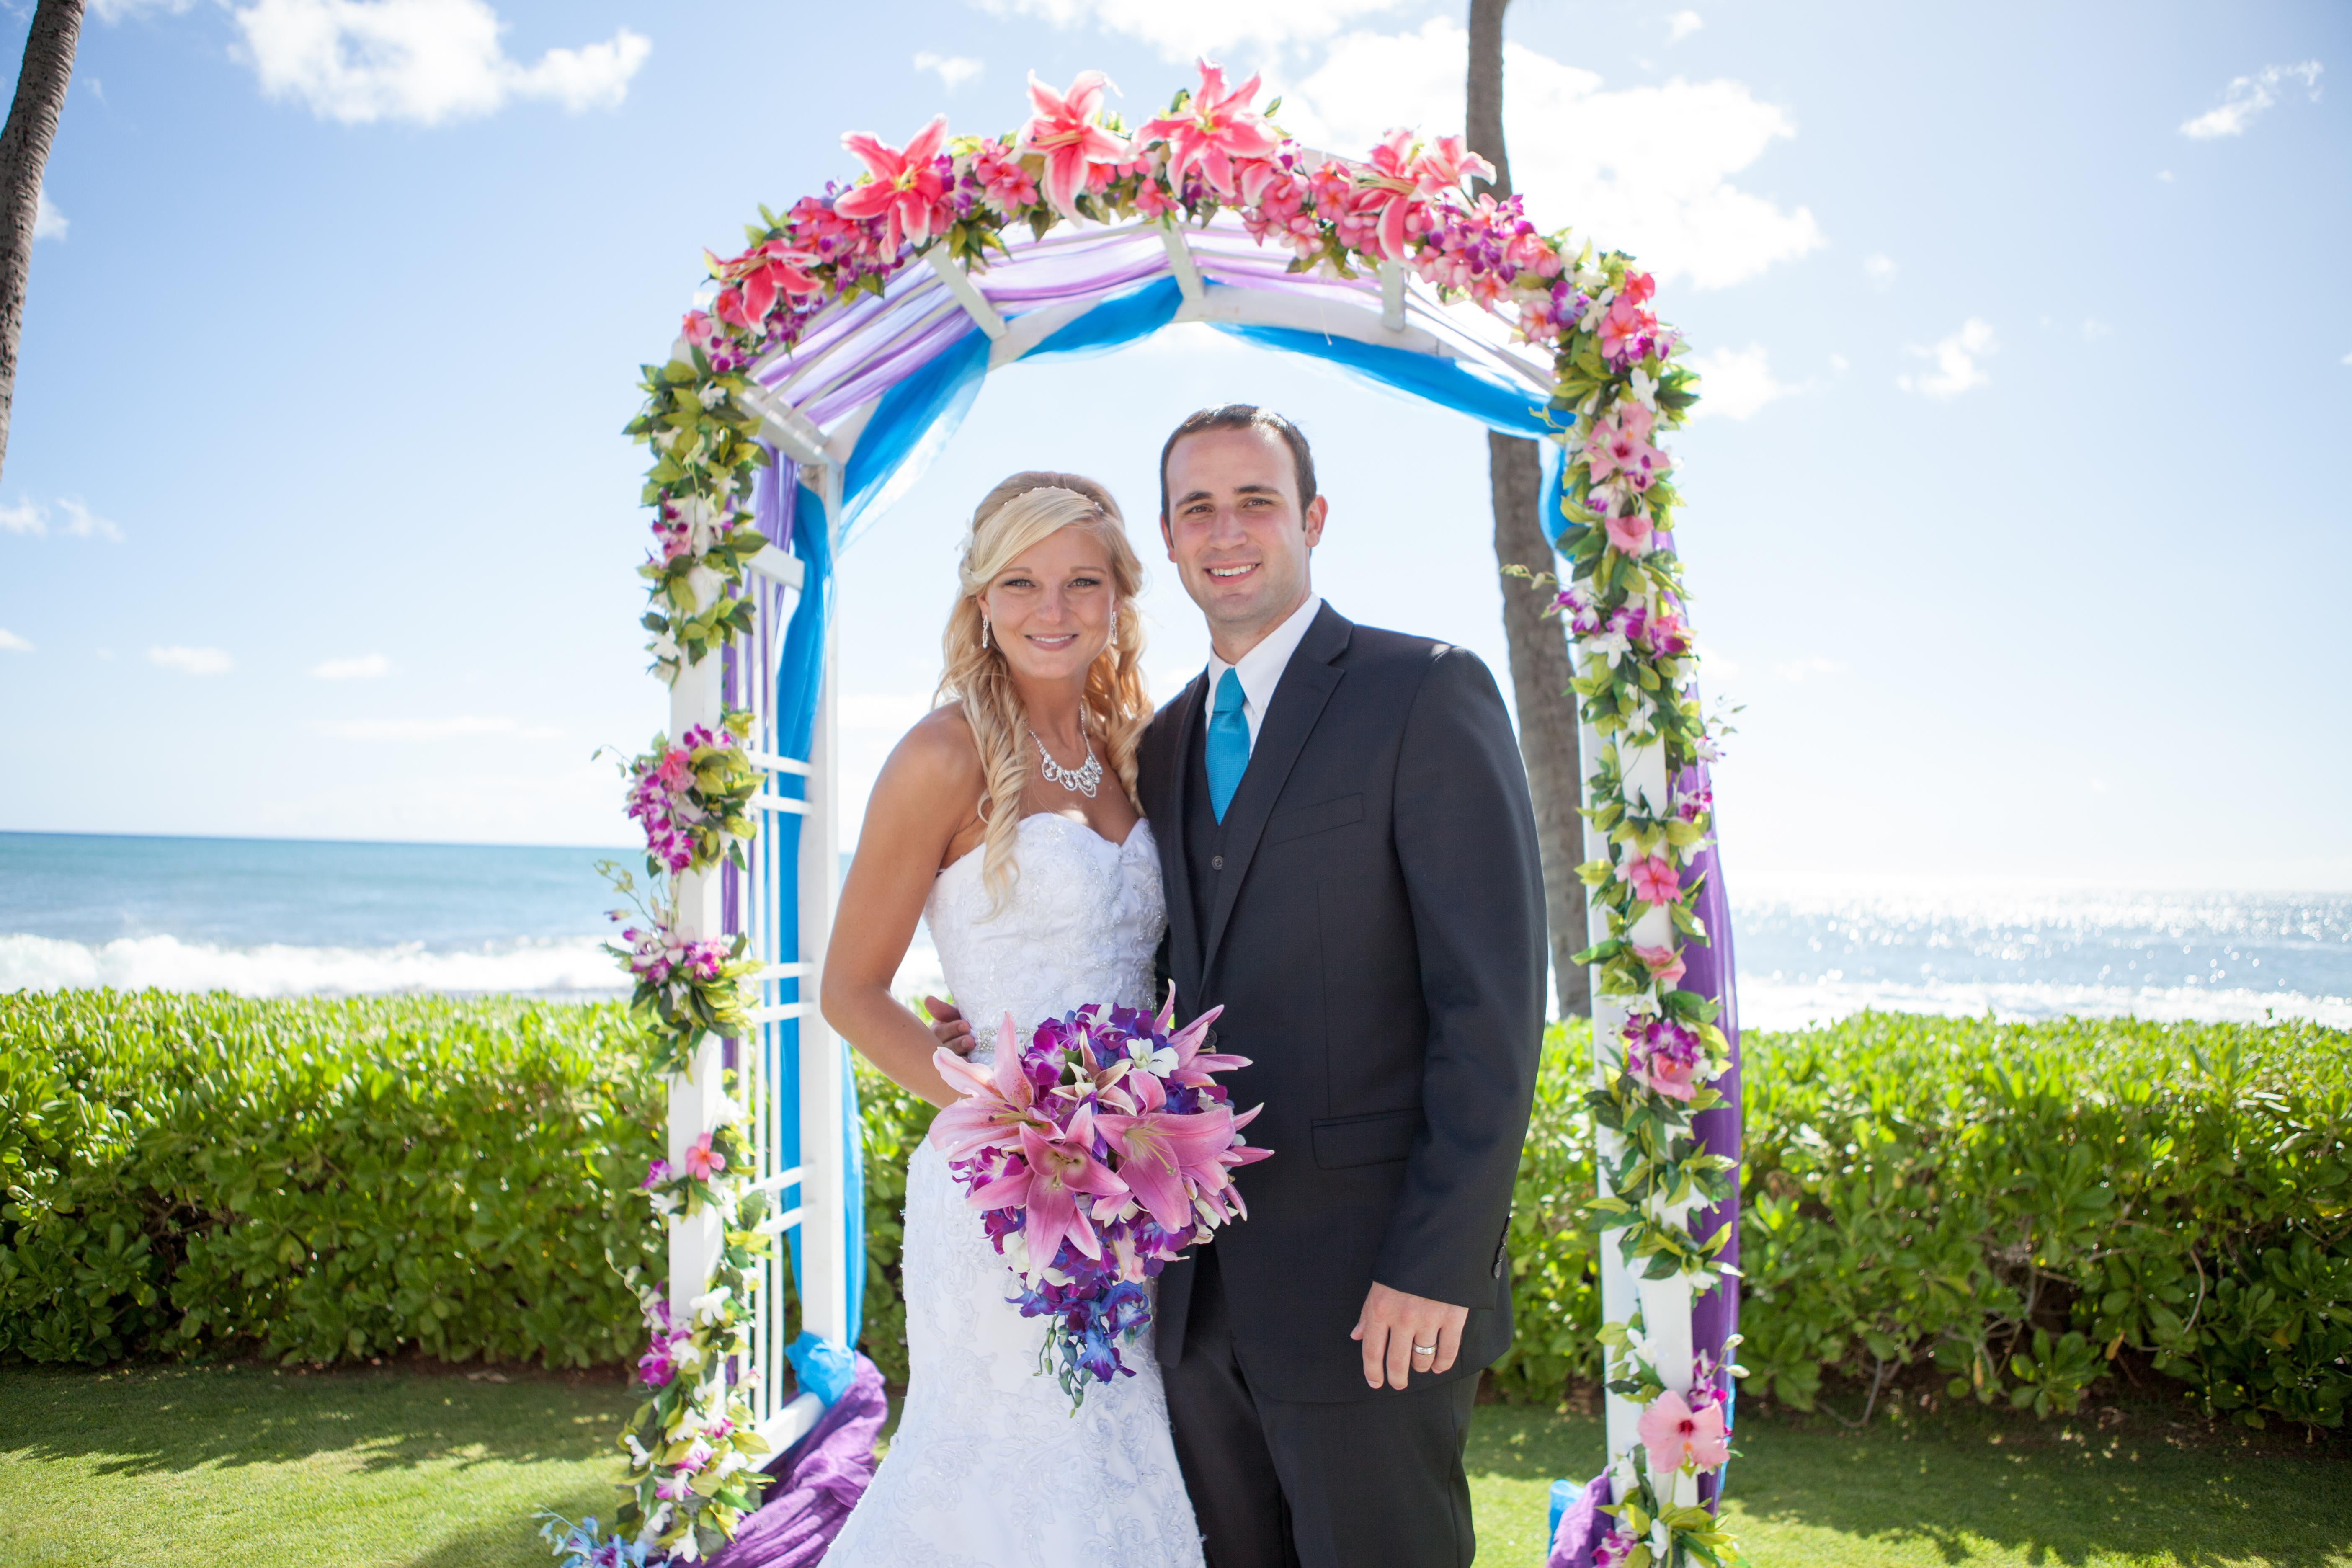 Hawaii wedding paradise cove 11